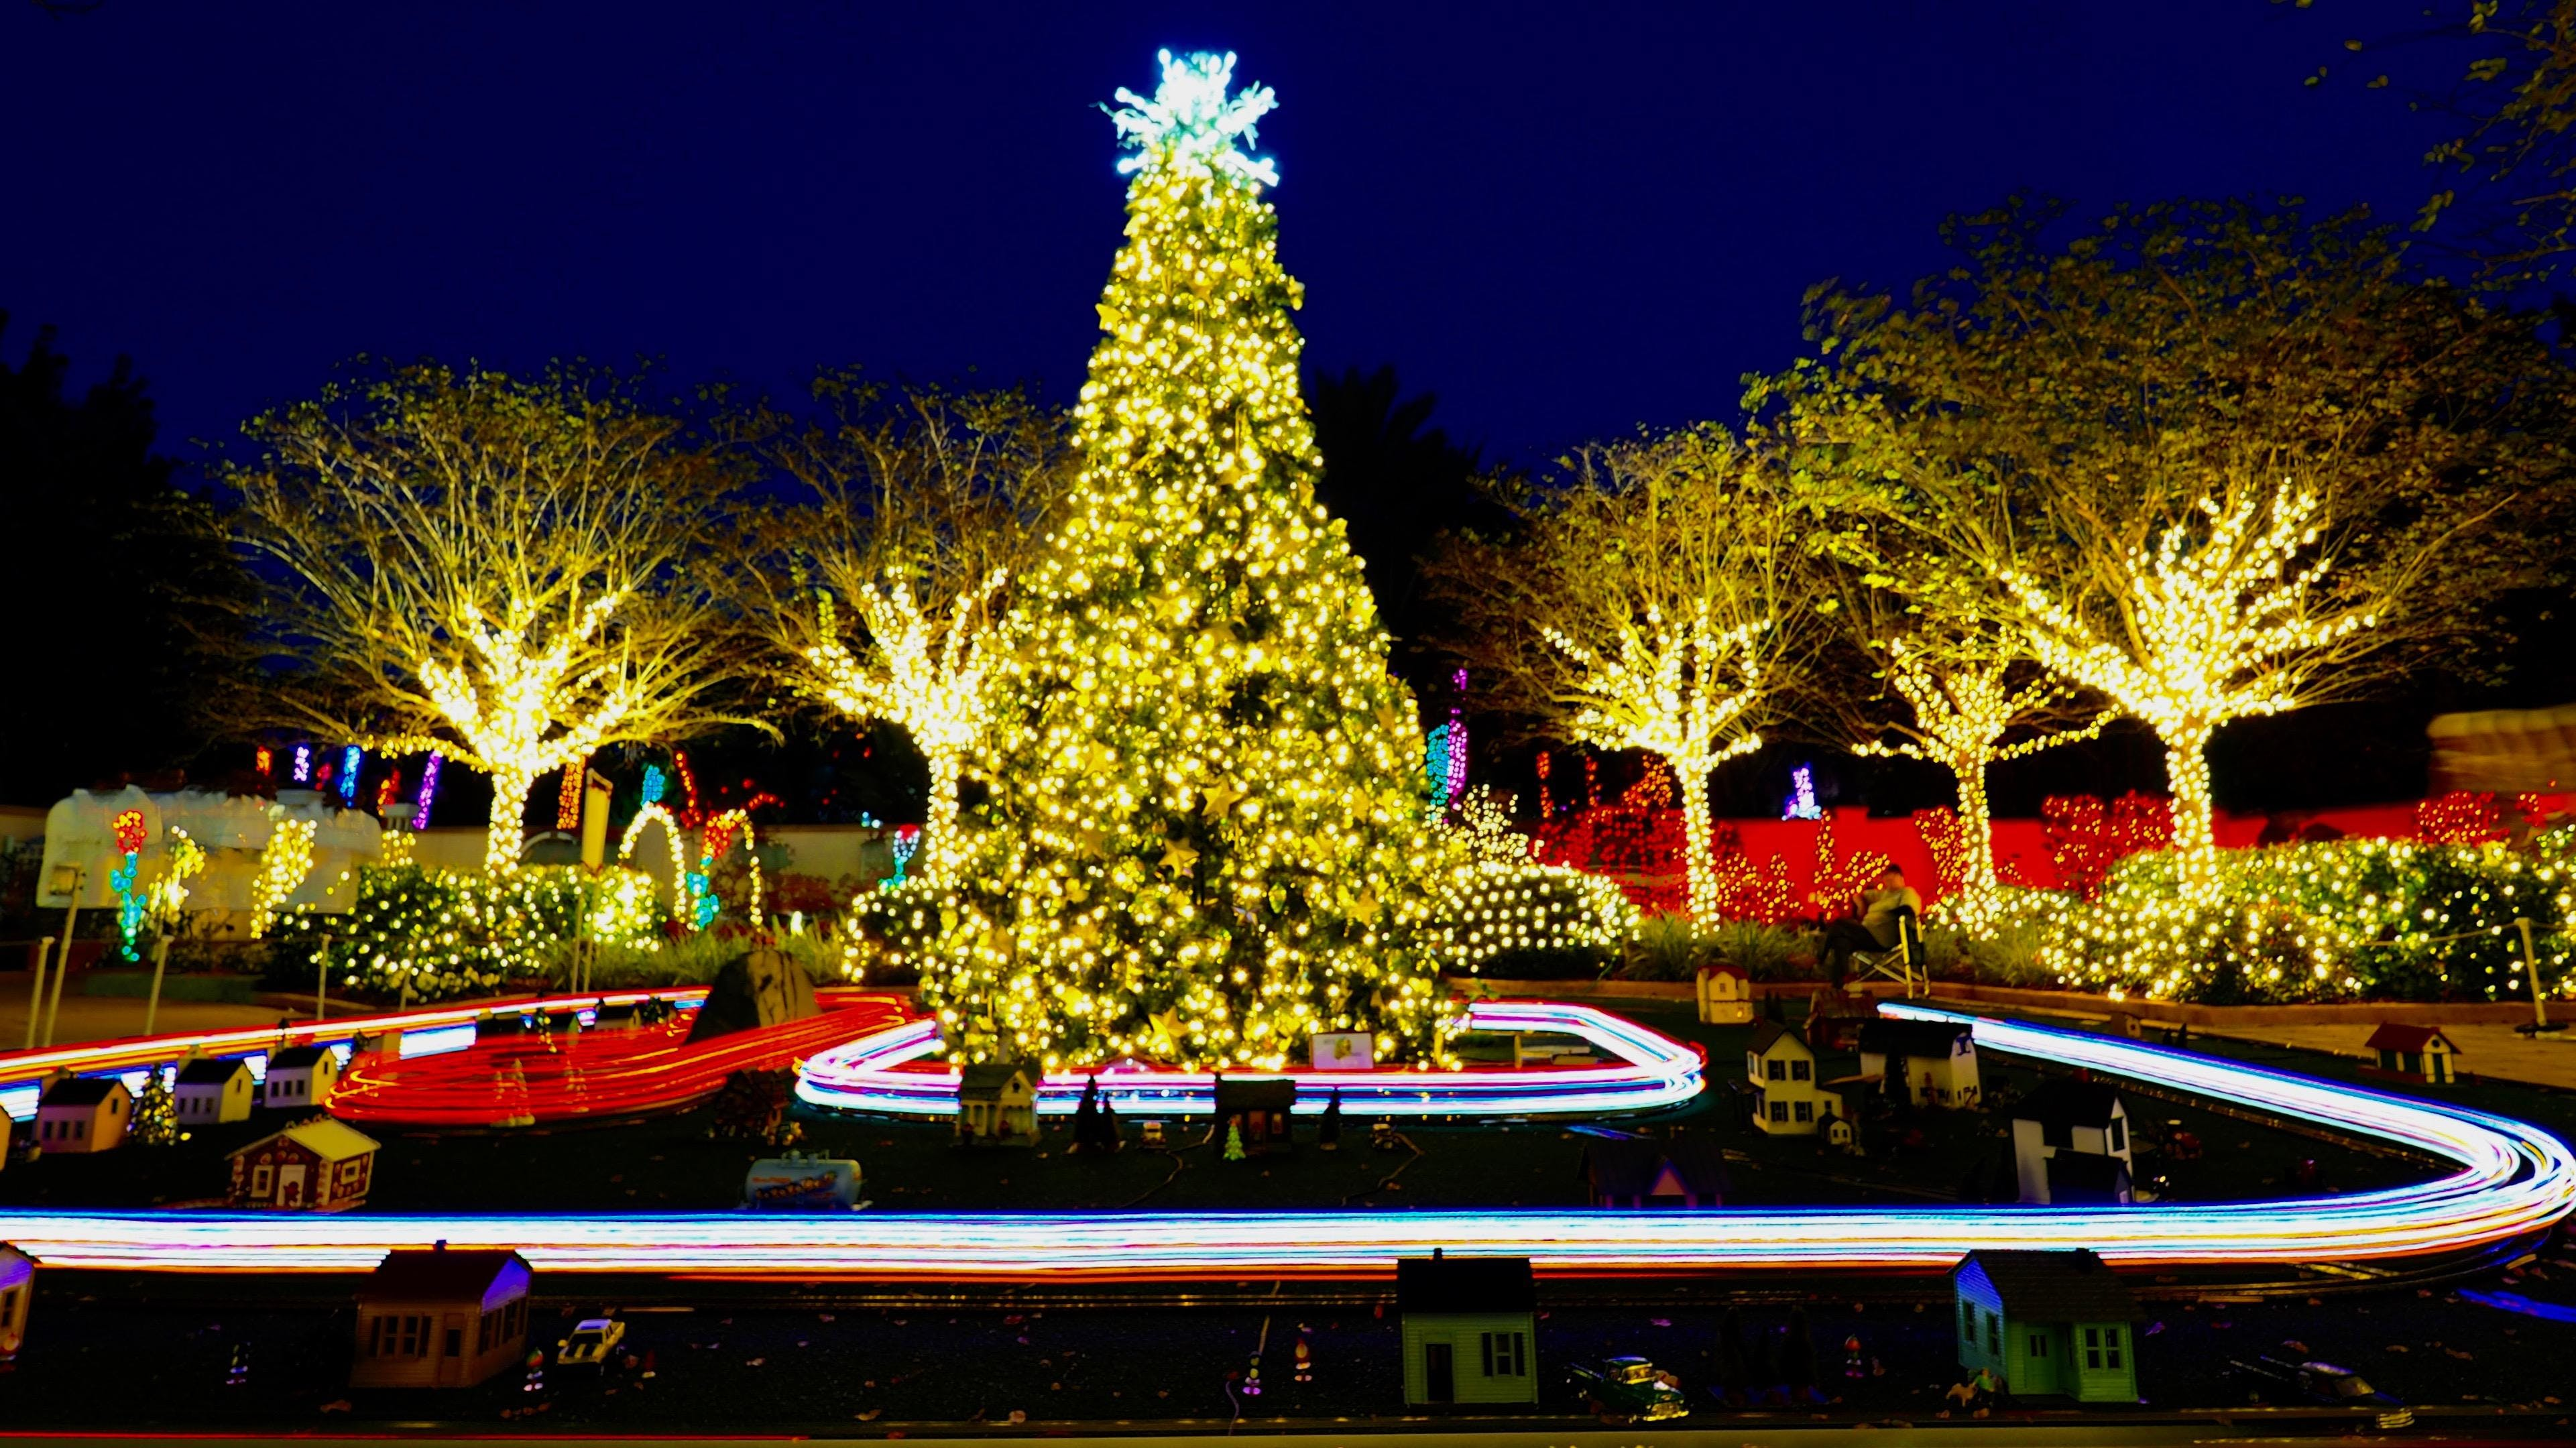 433701 1570561028 - Florida Botanical Garden Florida Botanical Gardens December 5